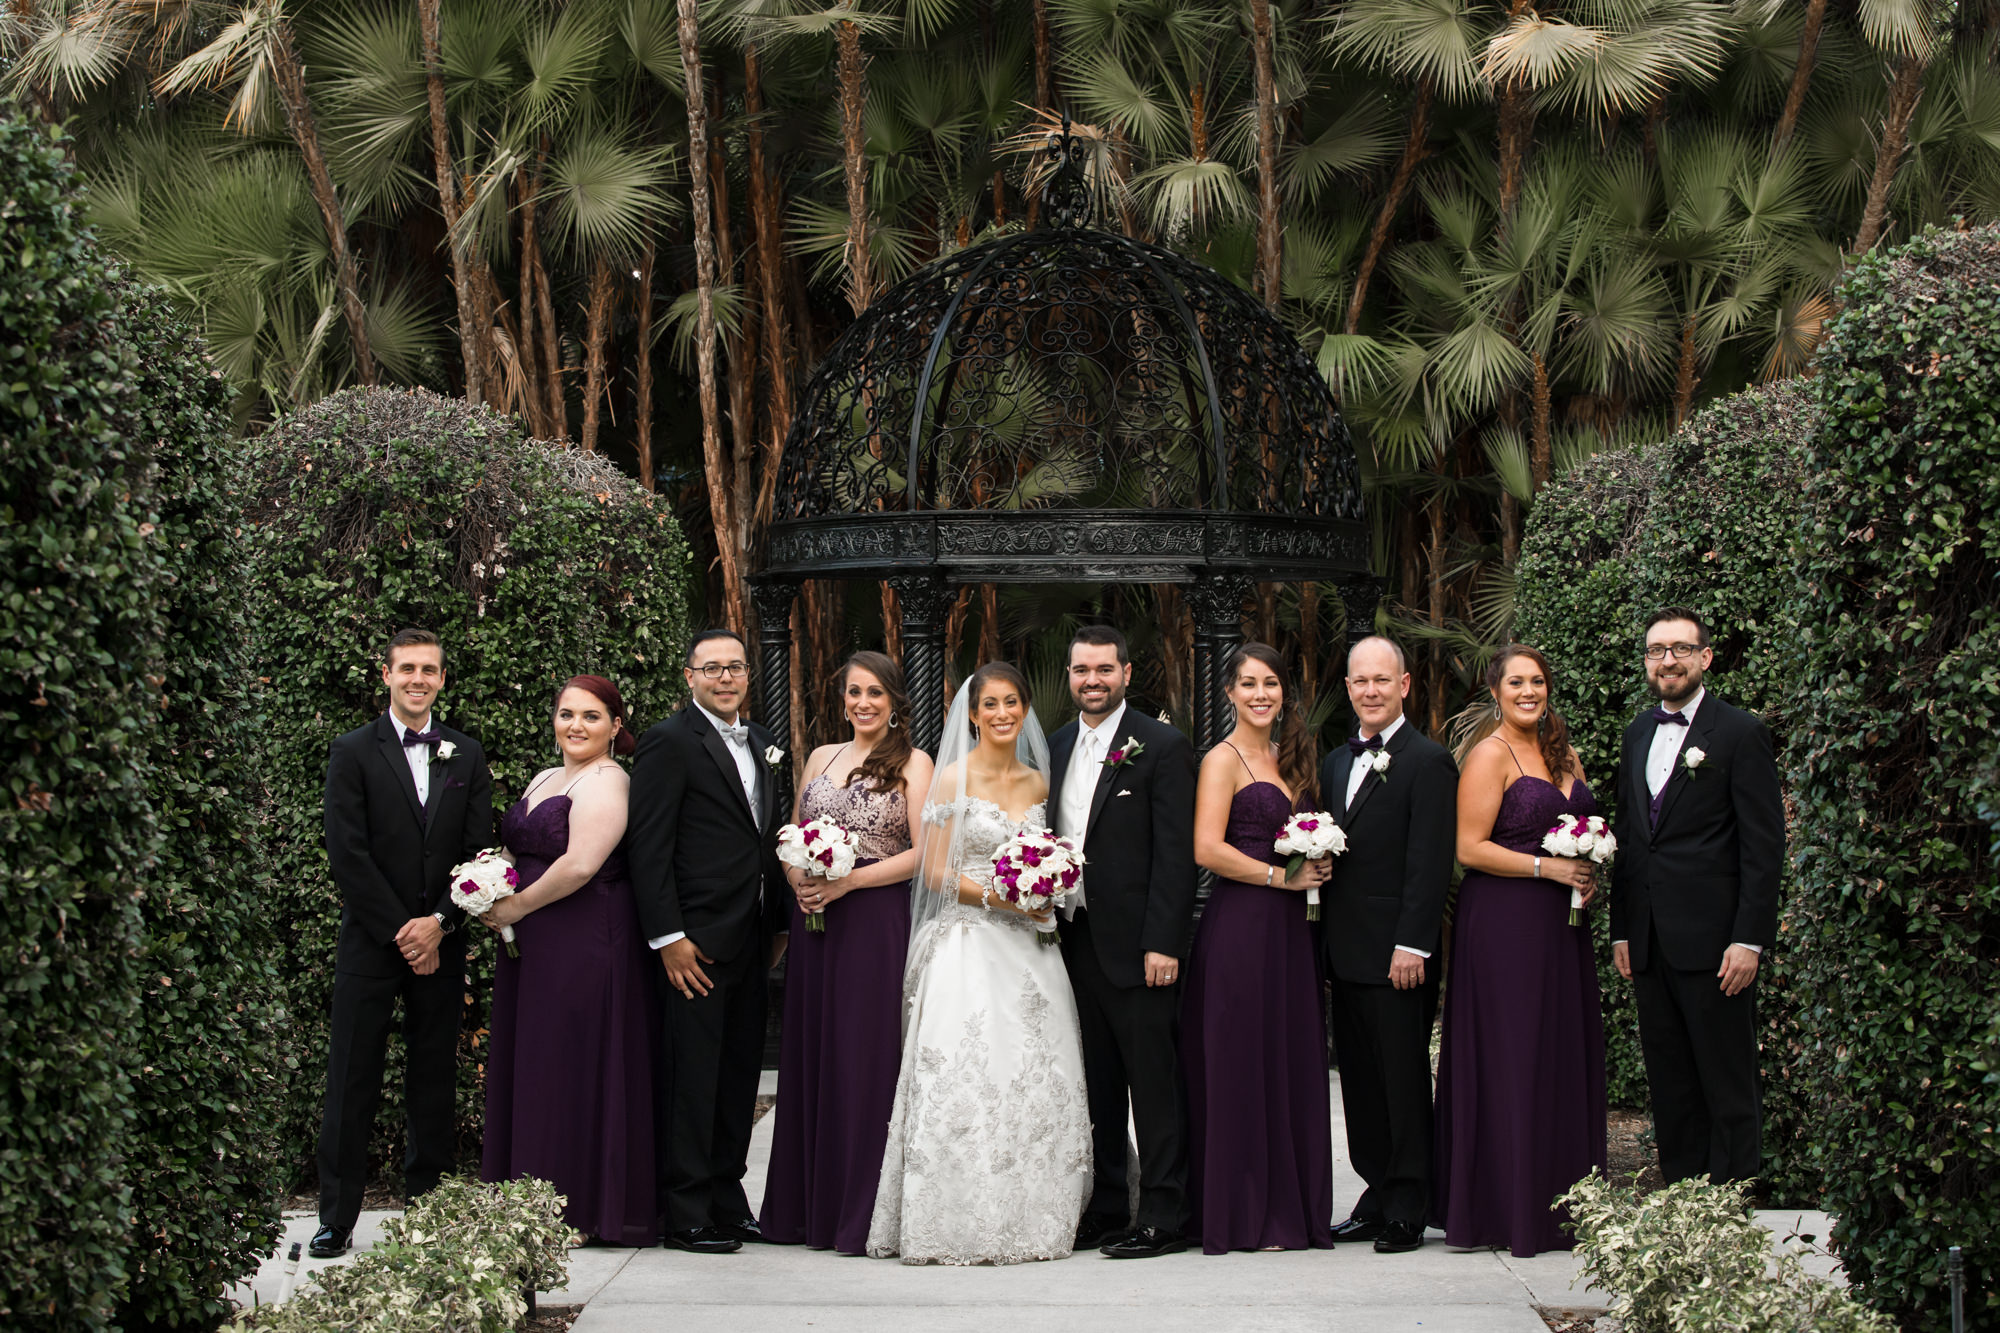 Benvenuto_Wedding_catholic_Florida_Bride-Groom-65.jpg